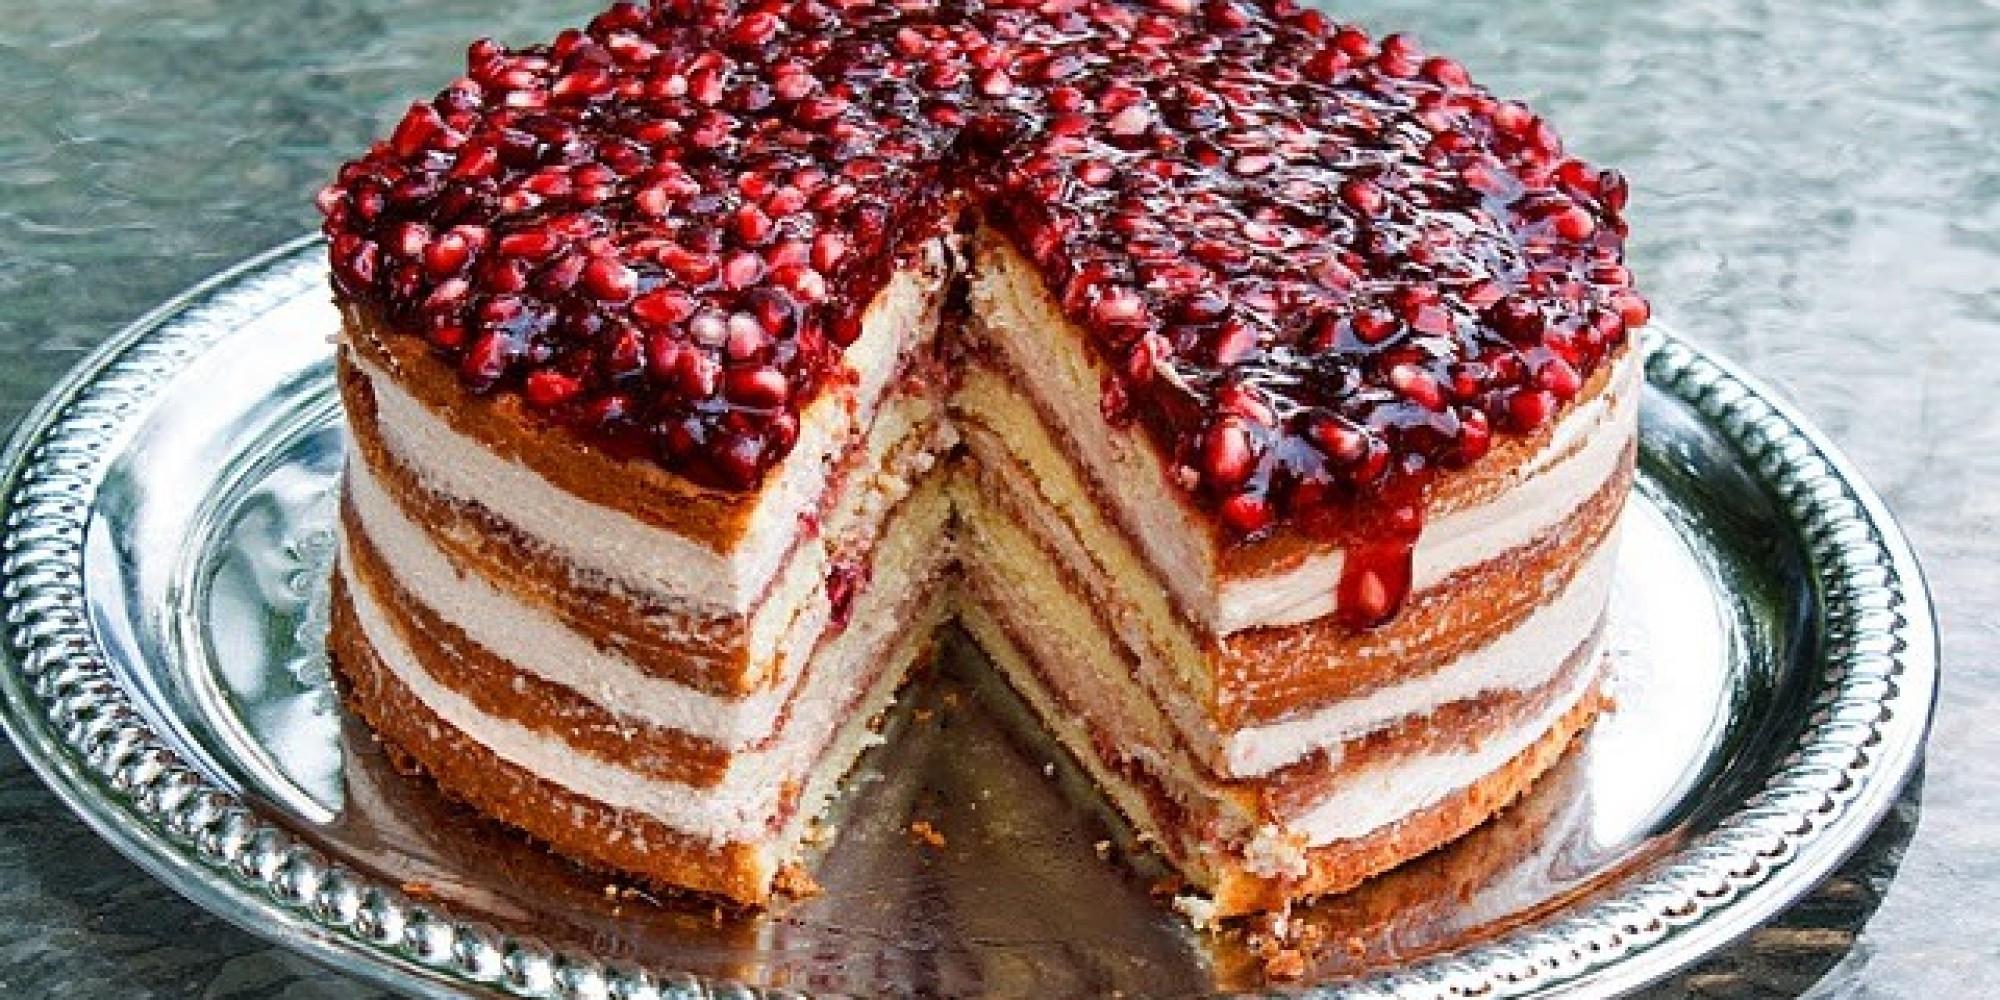 Popular Christmas Desserts  The Most Stunning Christmas Dessert Recipes Ever PHOTOS